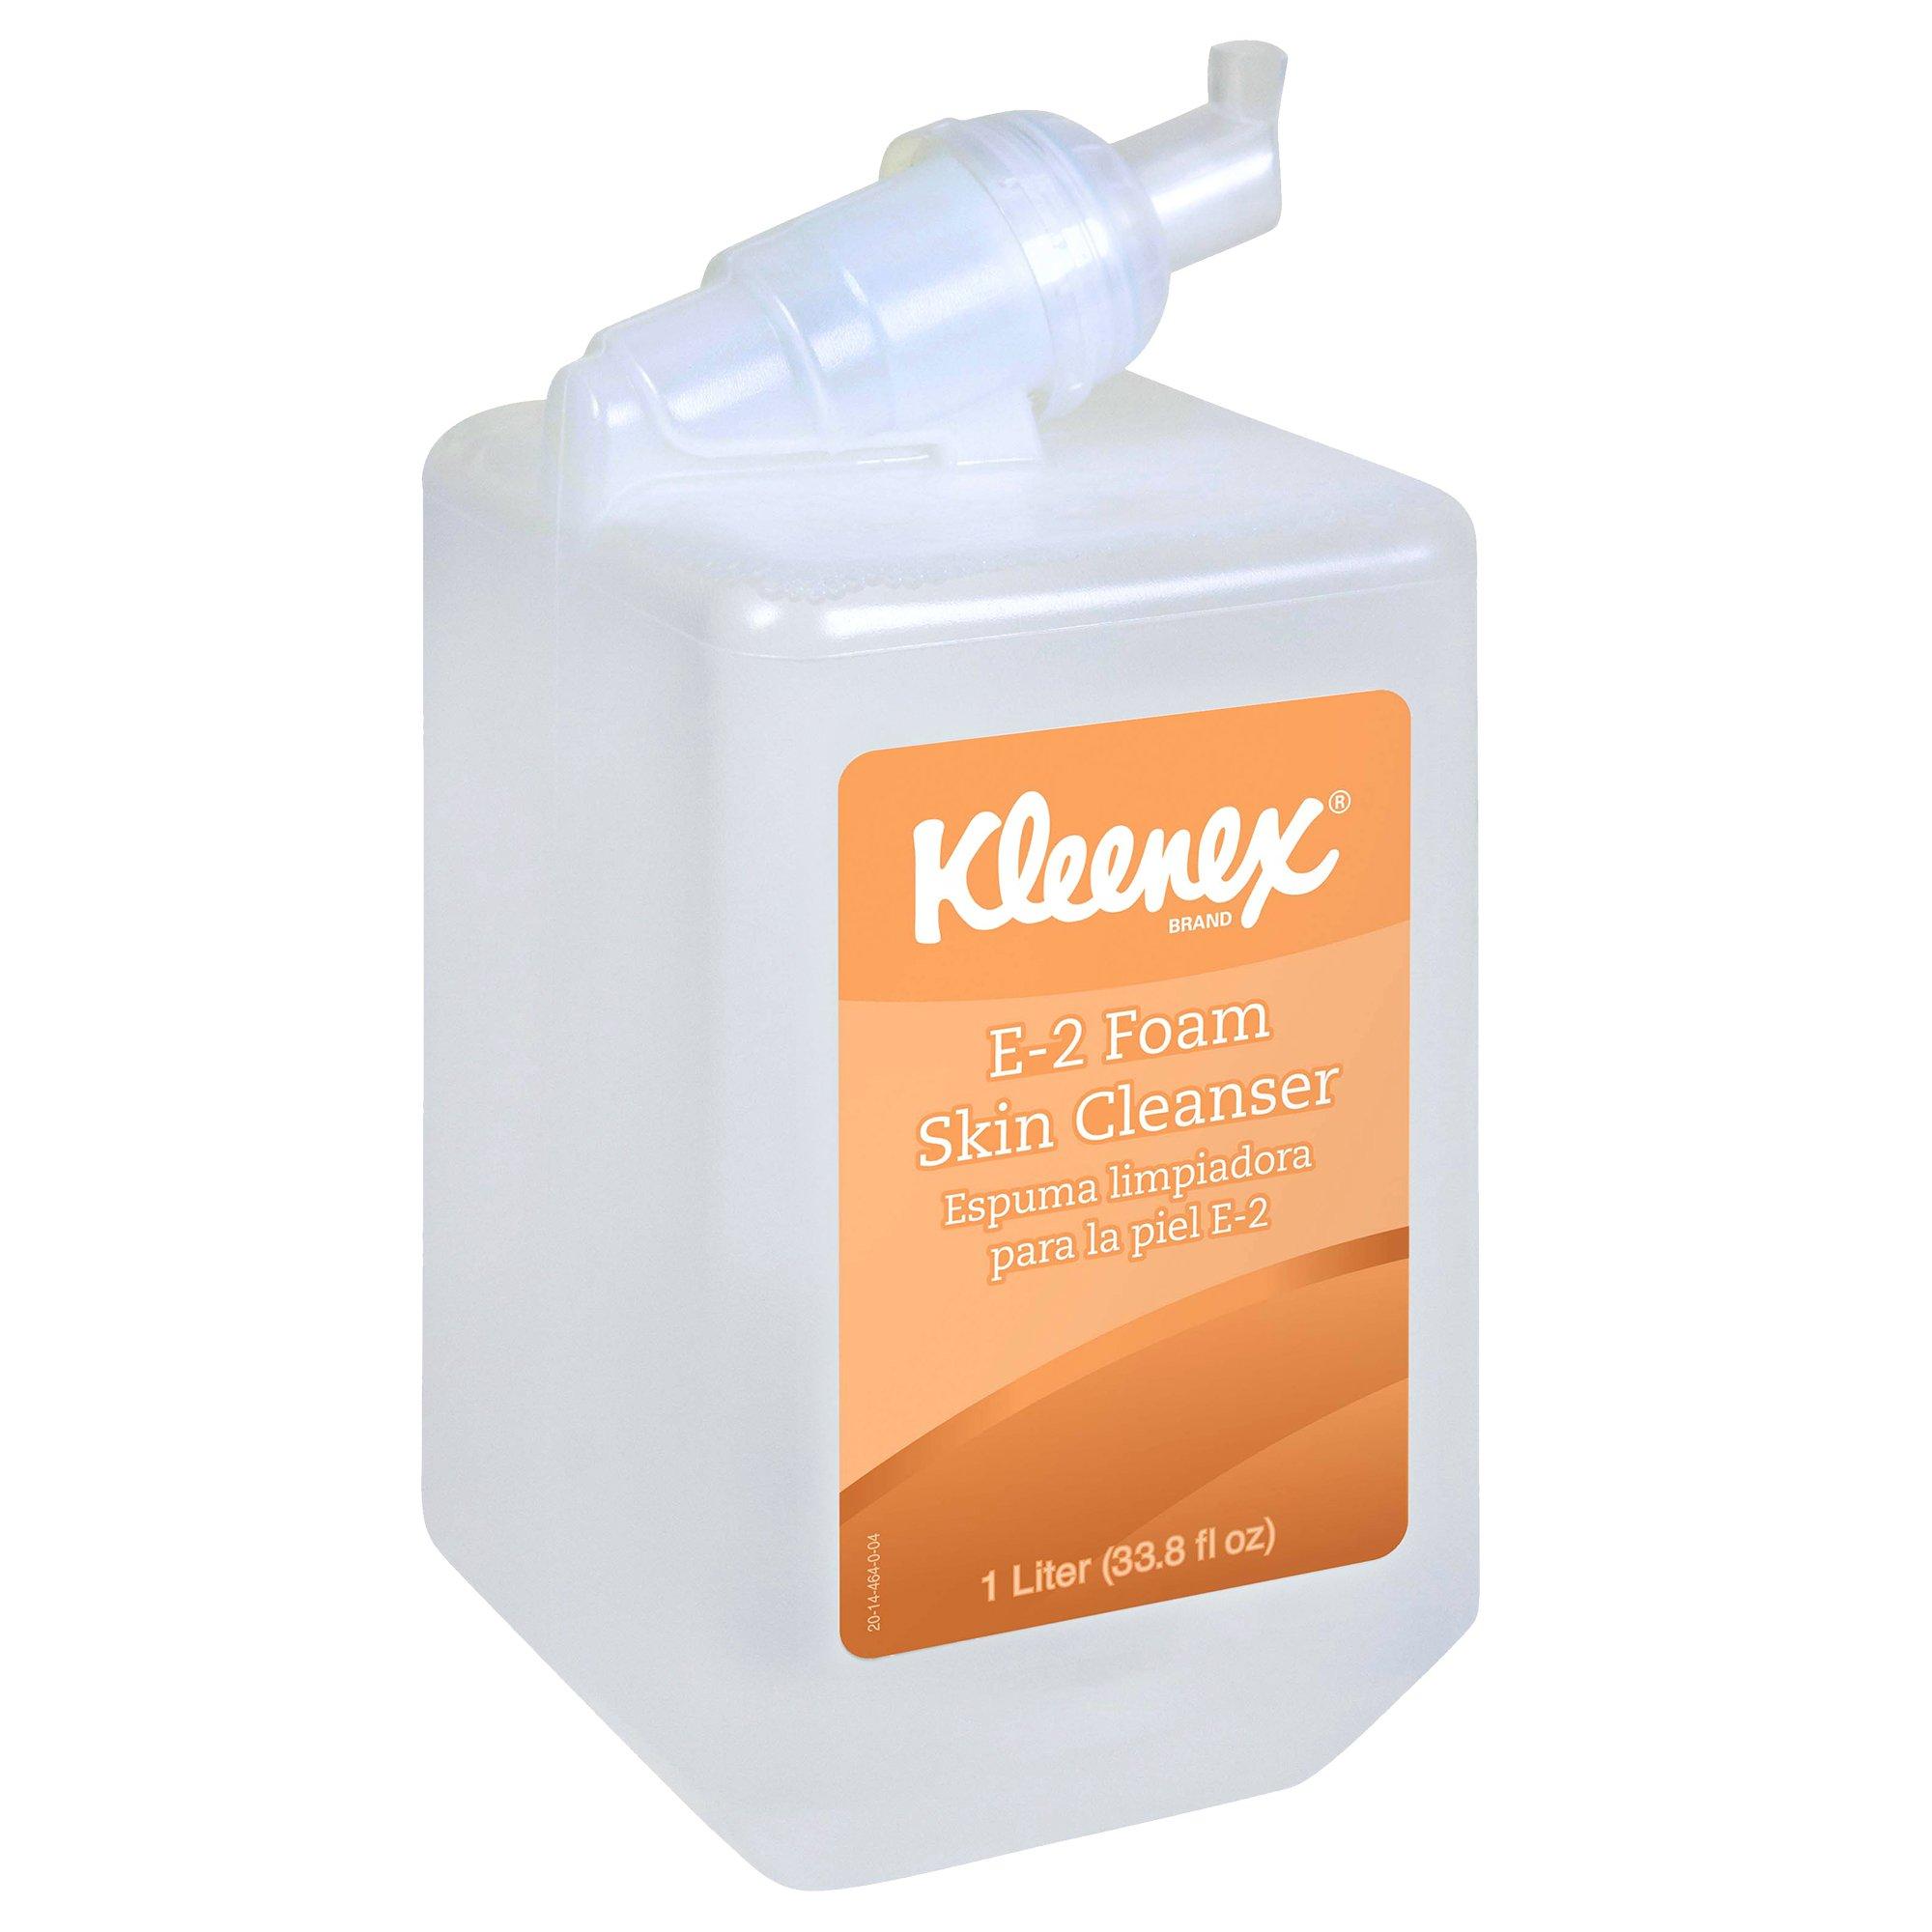 KLEENEX 91555 1000 mL Luxury Foam E-2 Skin Cleanser (6 per Case)